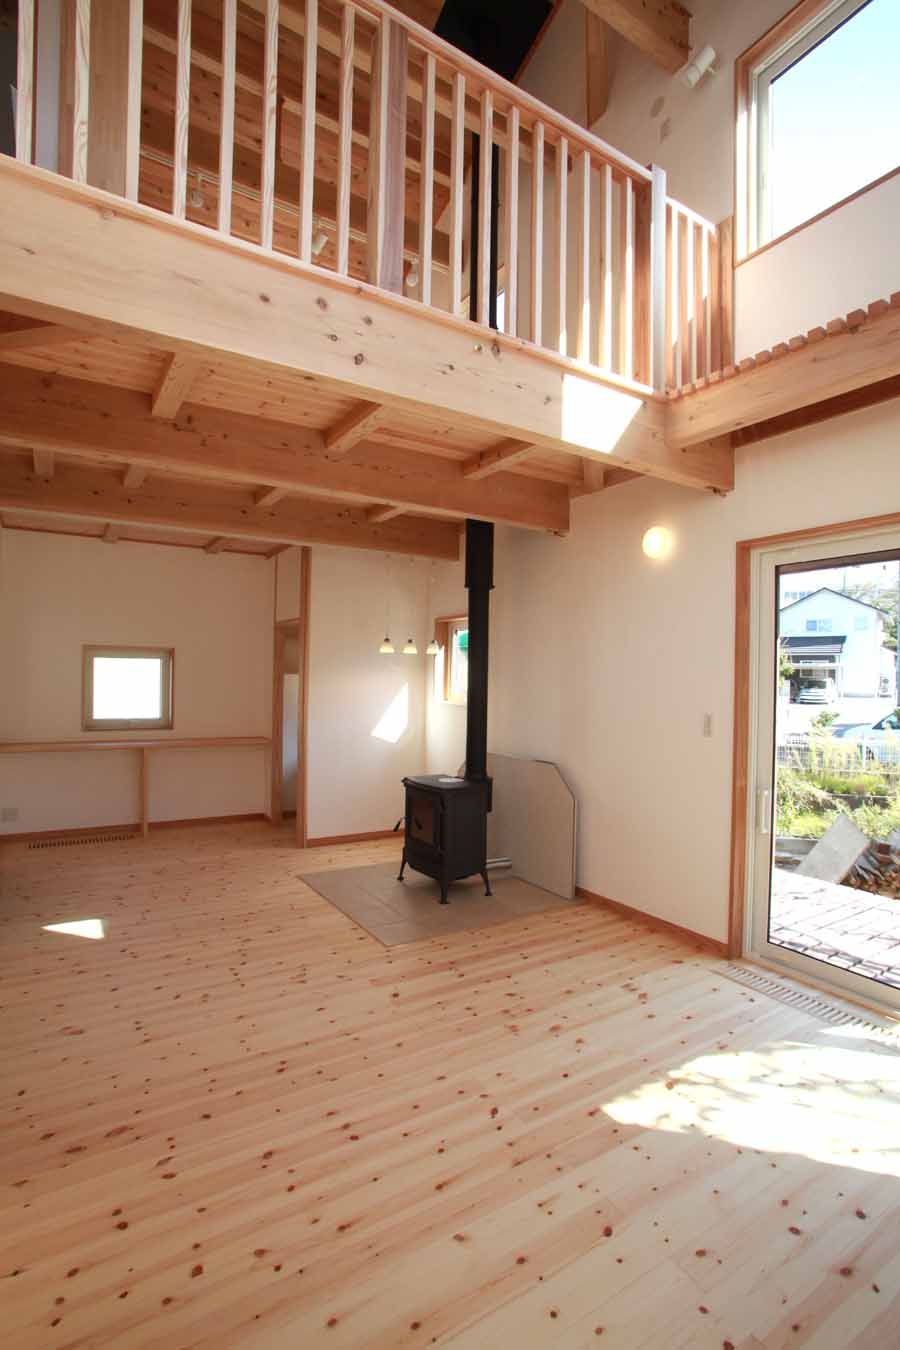 S様邸「新藤田の家」完成内覧会、 開催中です。_f0150893_2339490.jpg